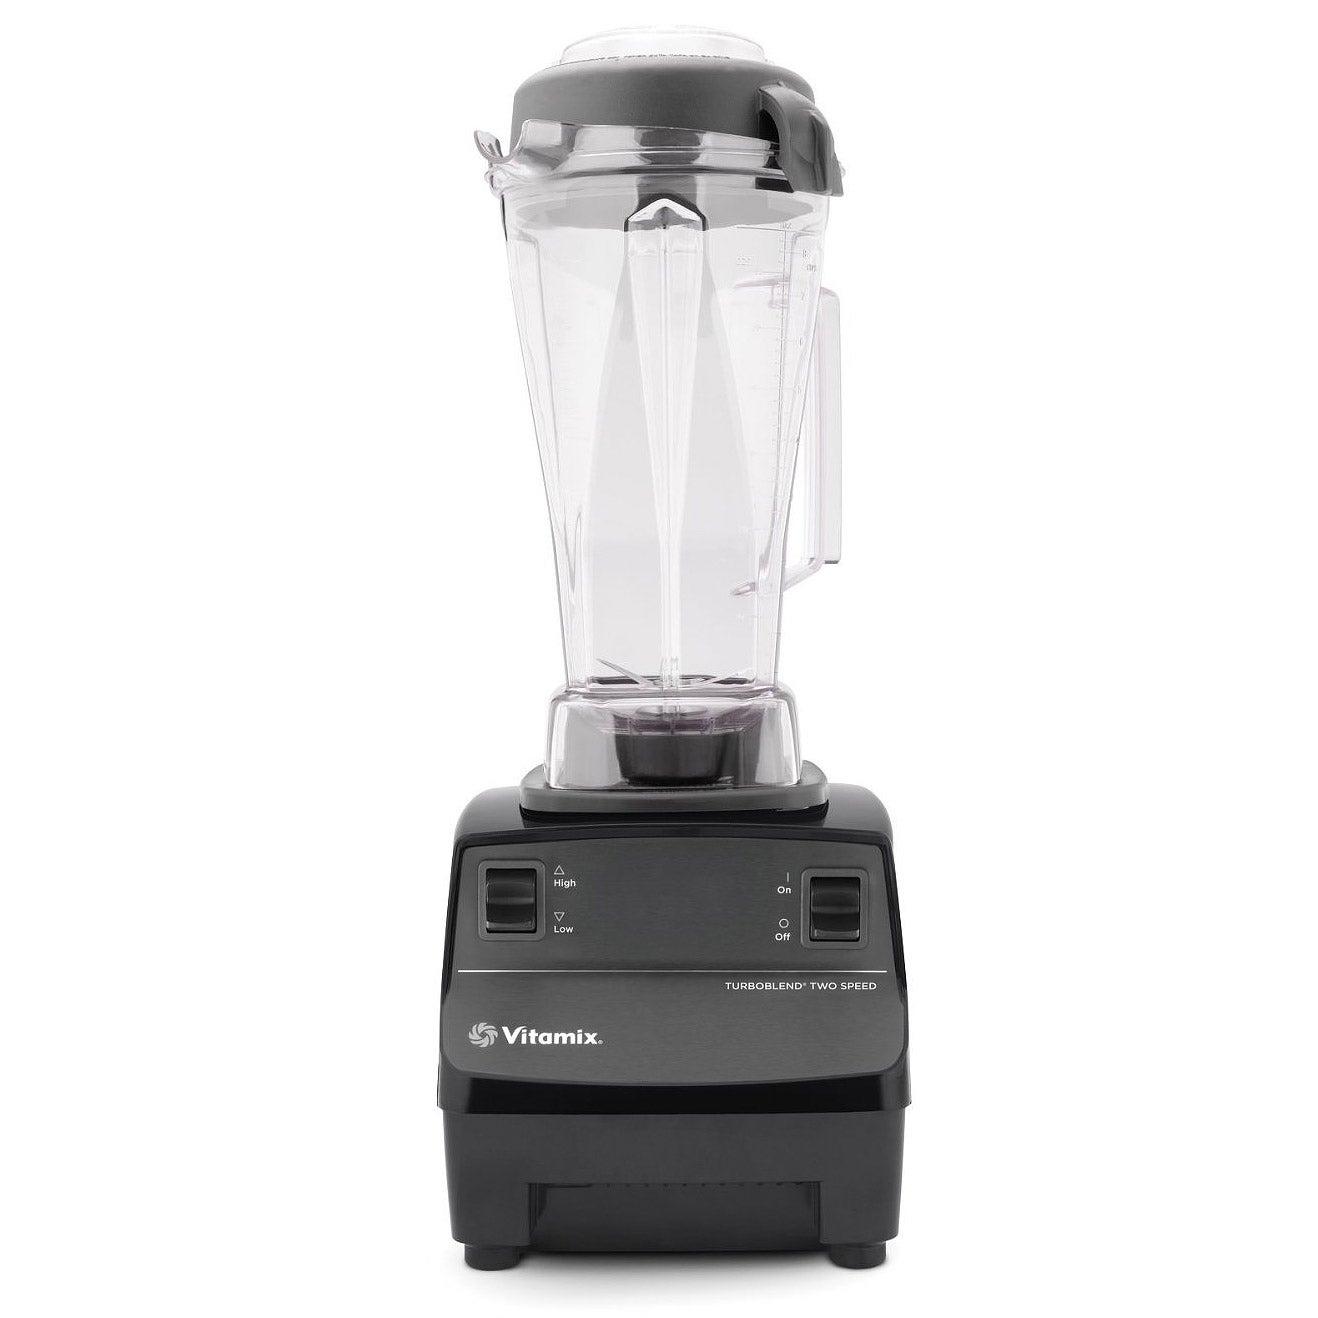 Vitamix TurboBlend 2-speed Blender